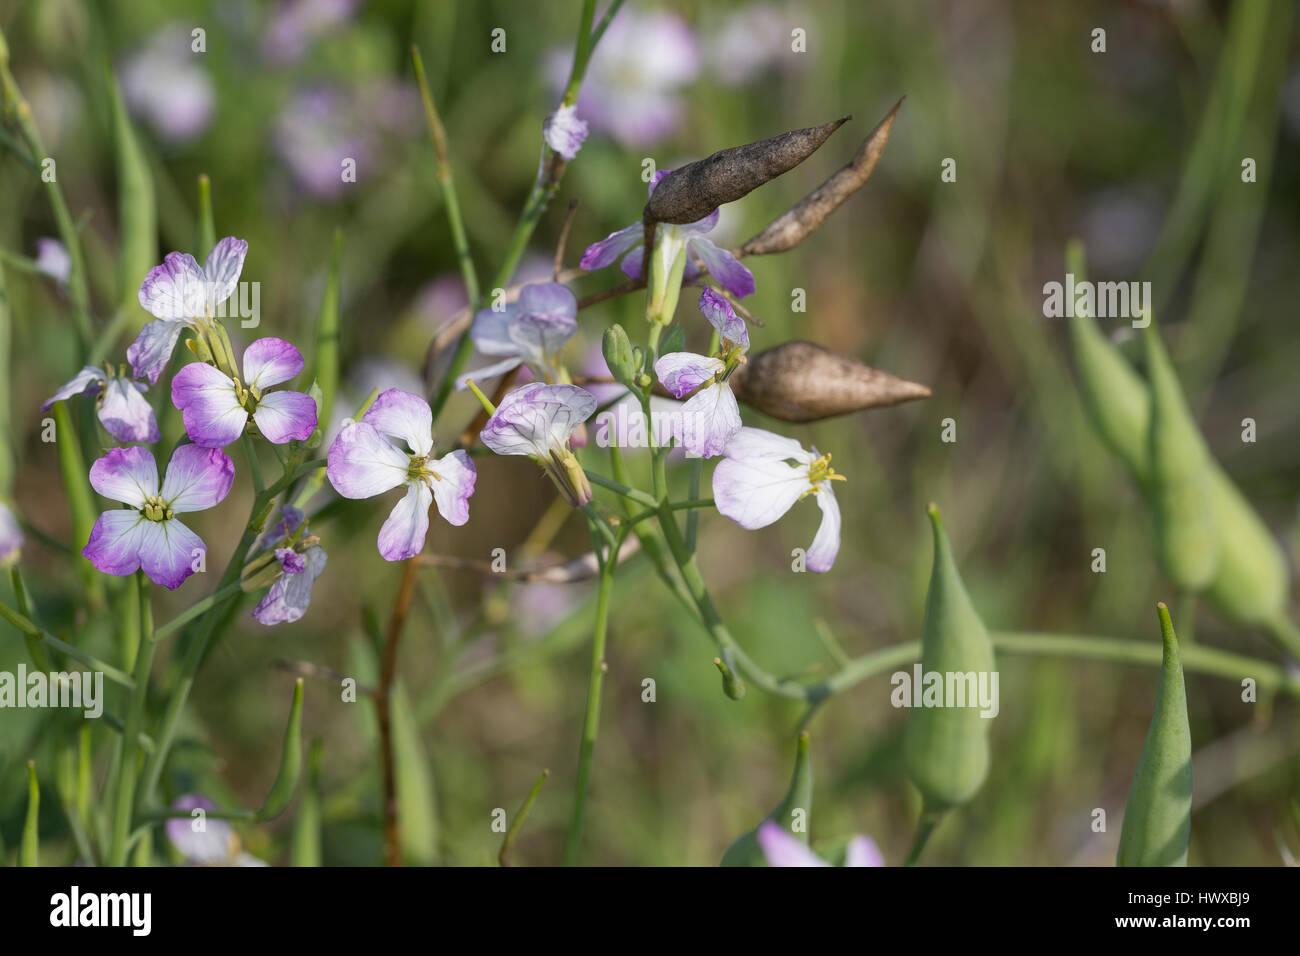 Garten-Rettich, Gartenrettich, Rettich, Raphanus sativus, radish, Le radis - Stock Image